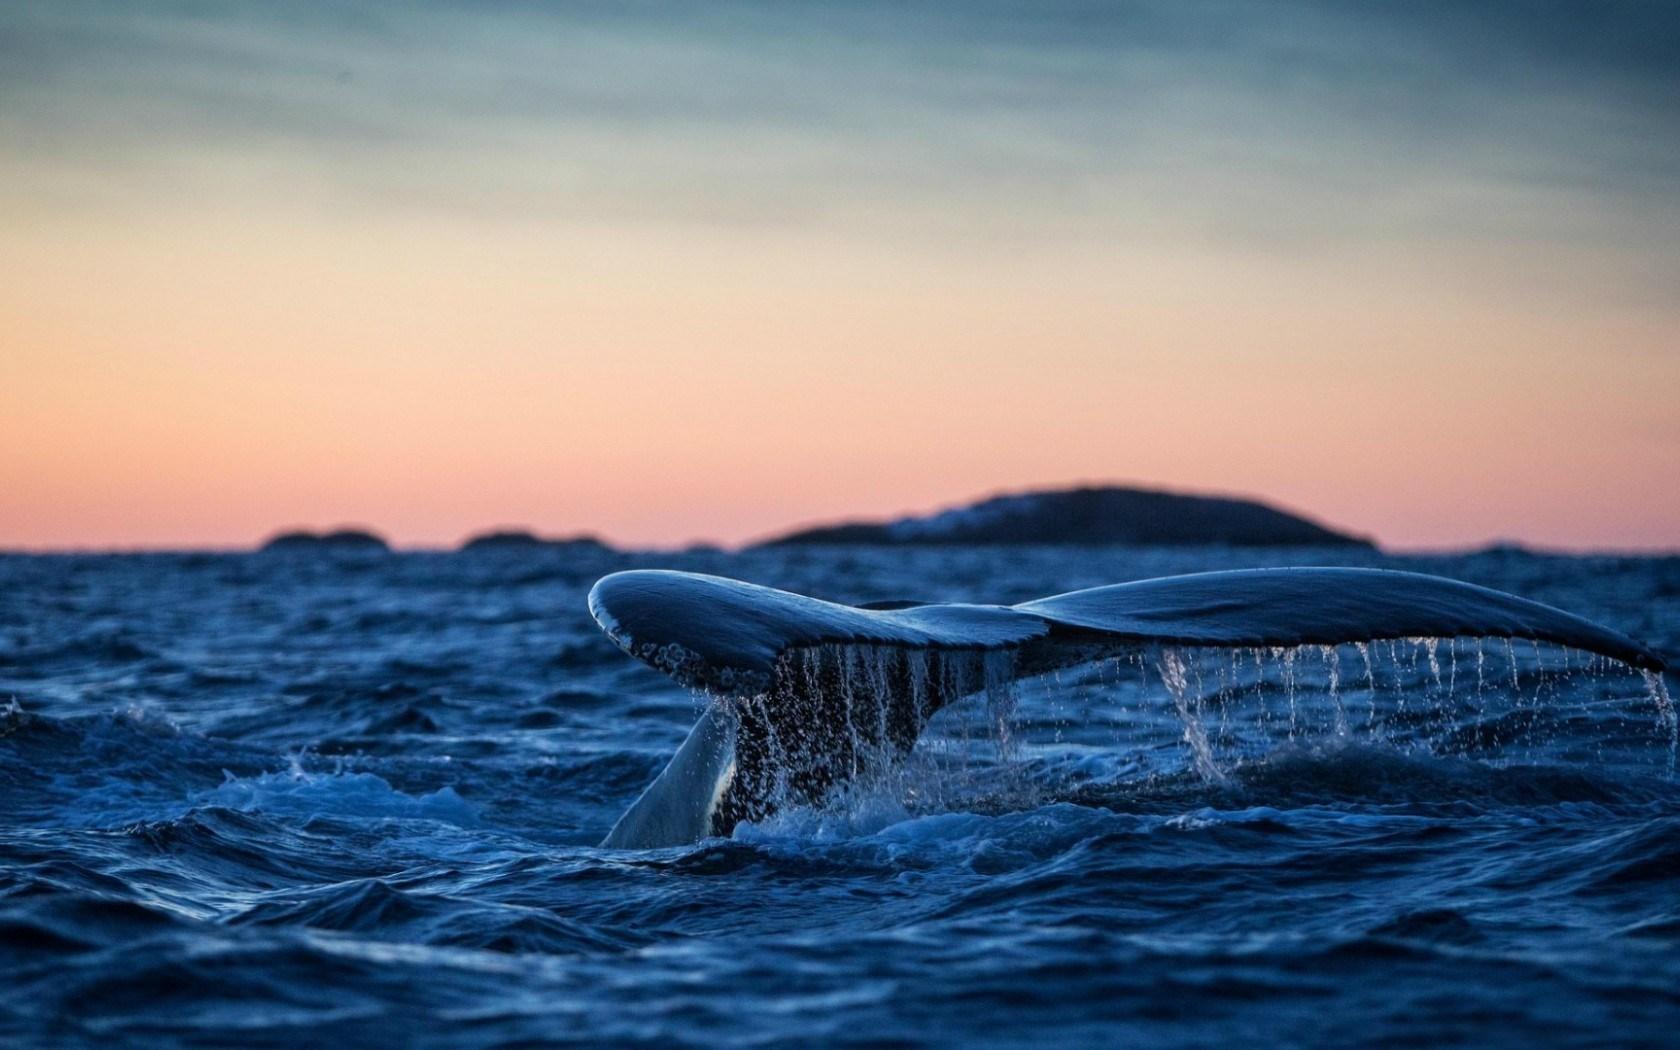 sea whale wallpaper